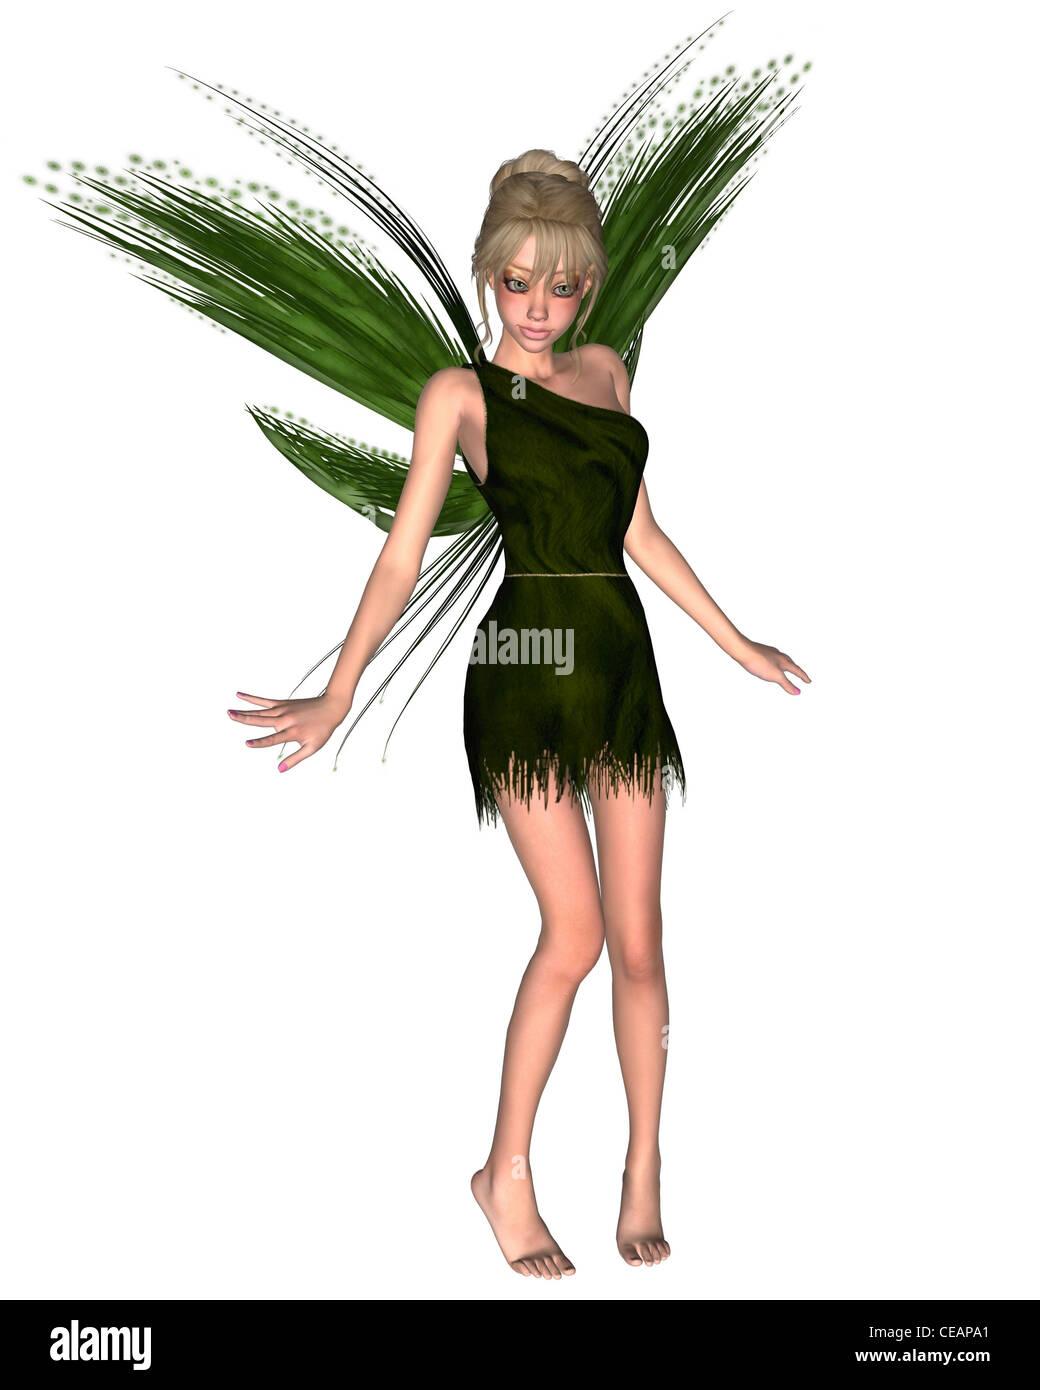 Fairy Tinkerbell - 3 - Stock Image